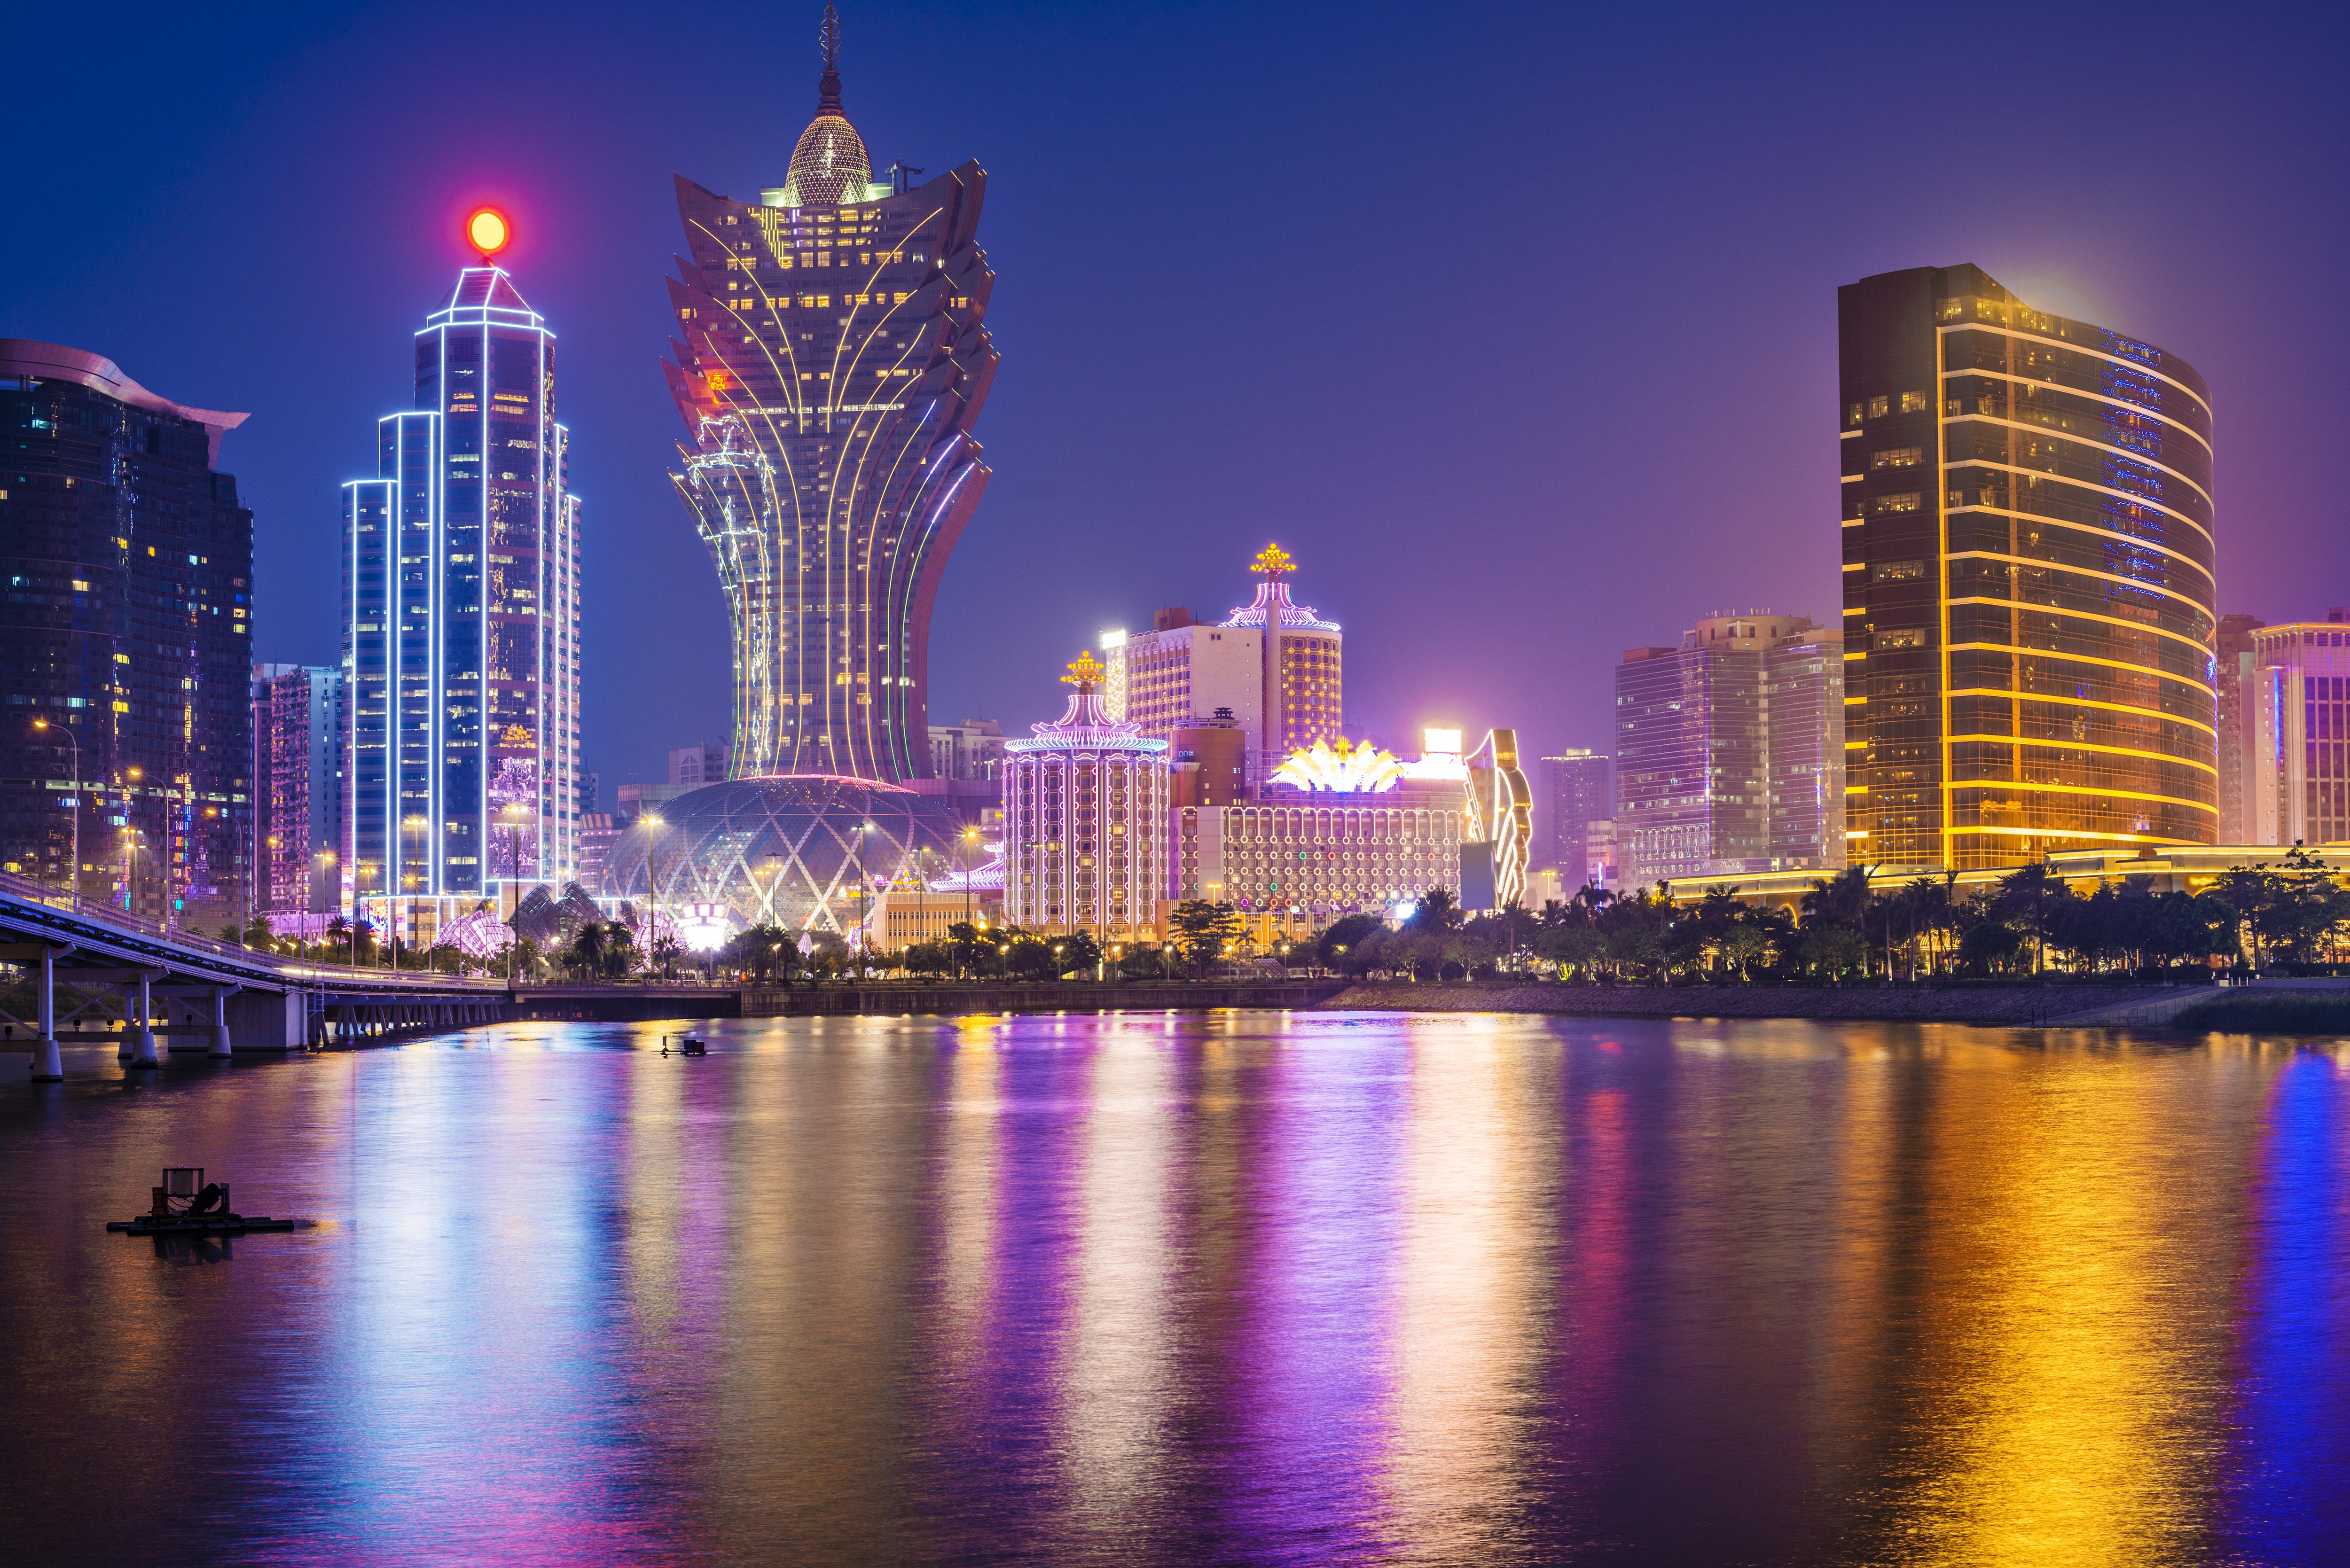 Macau Peninsula skyline at night.